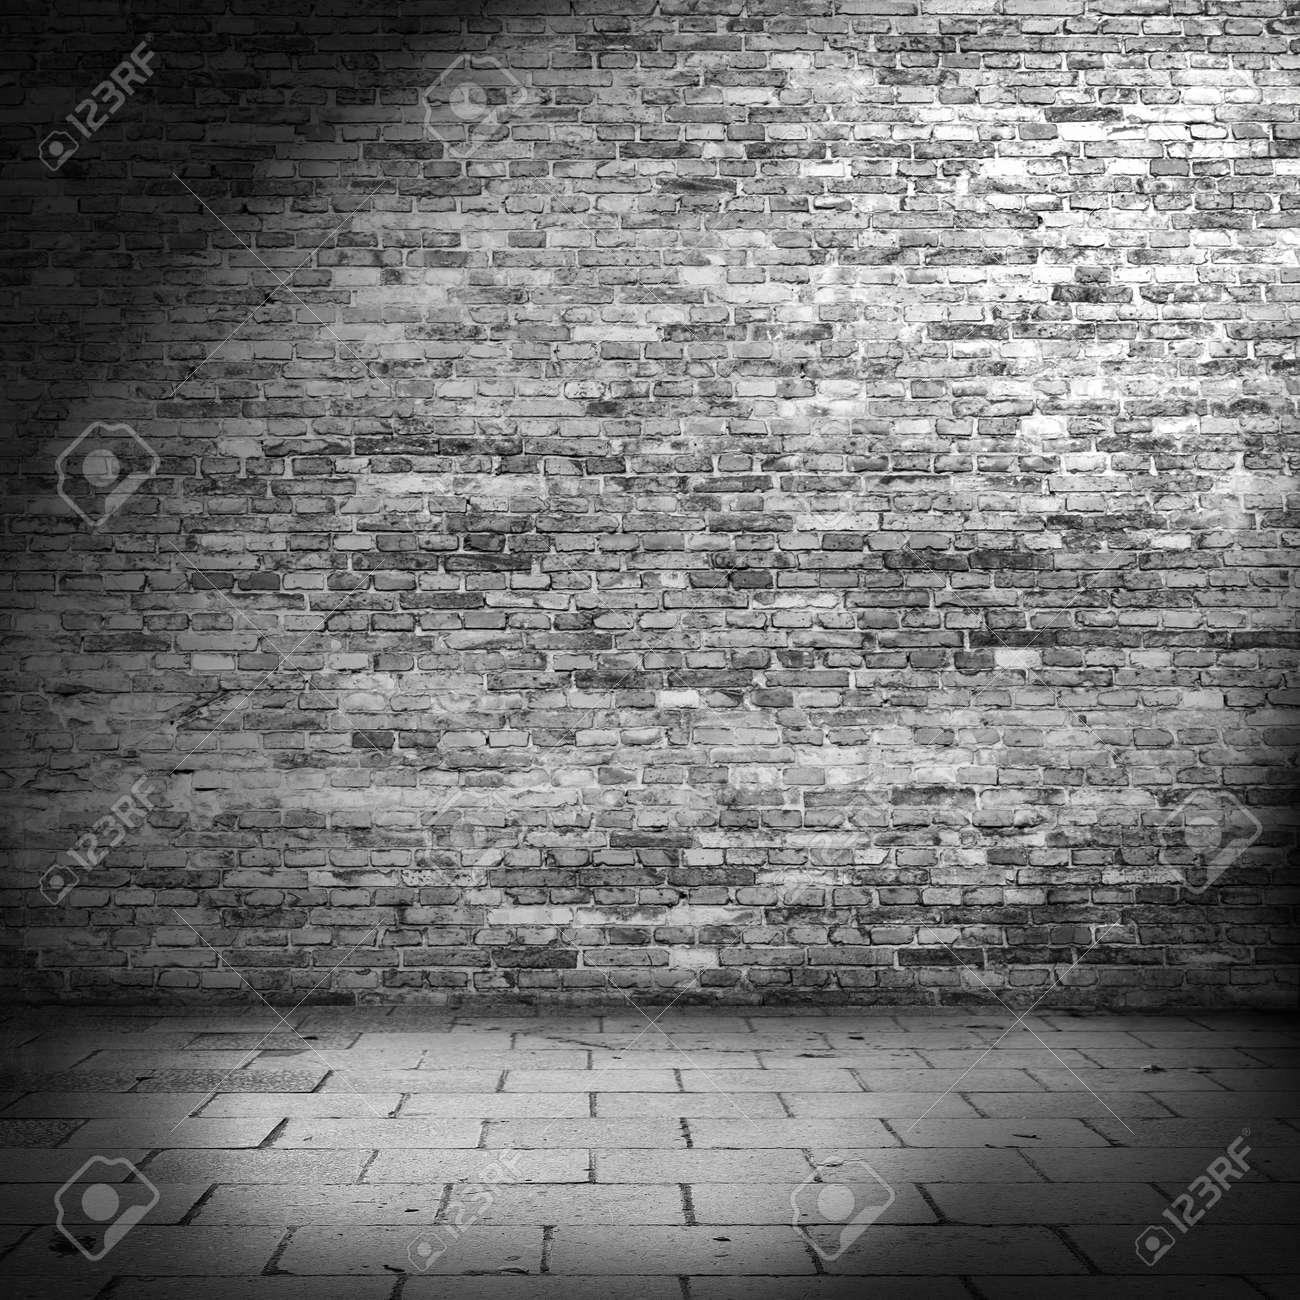 Dark Brick Wall Background In Basement With Beam Of Light Stock Photo